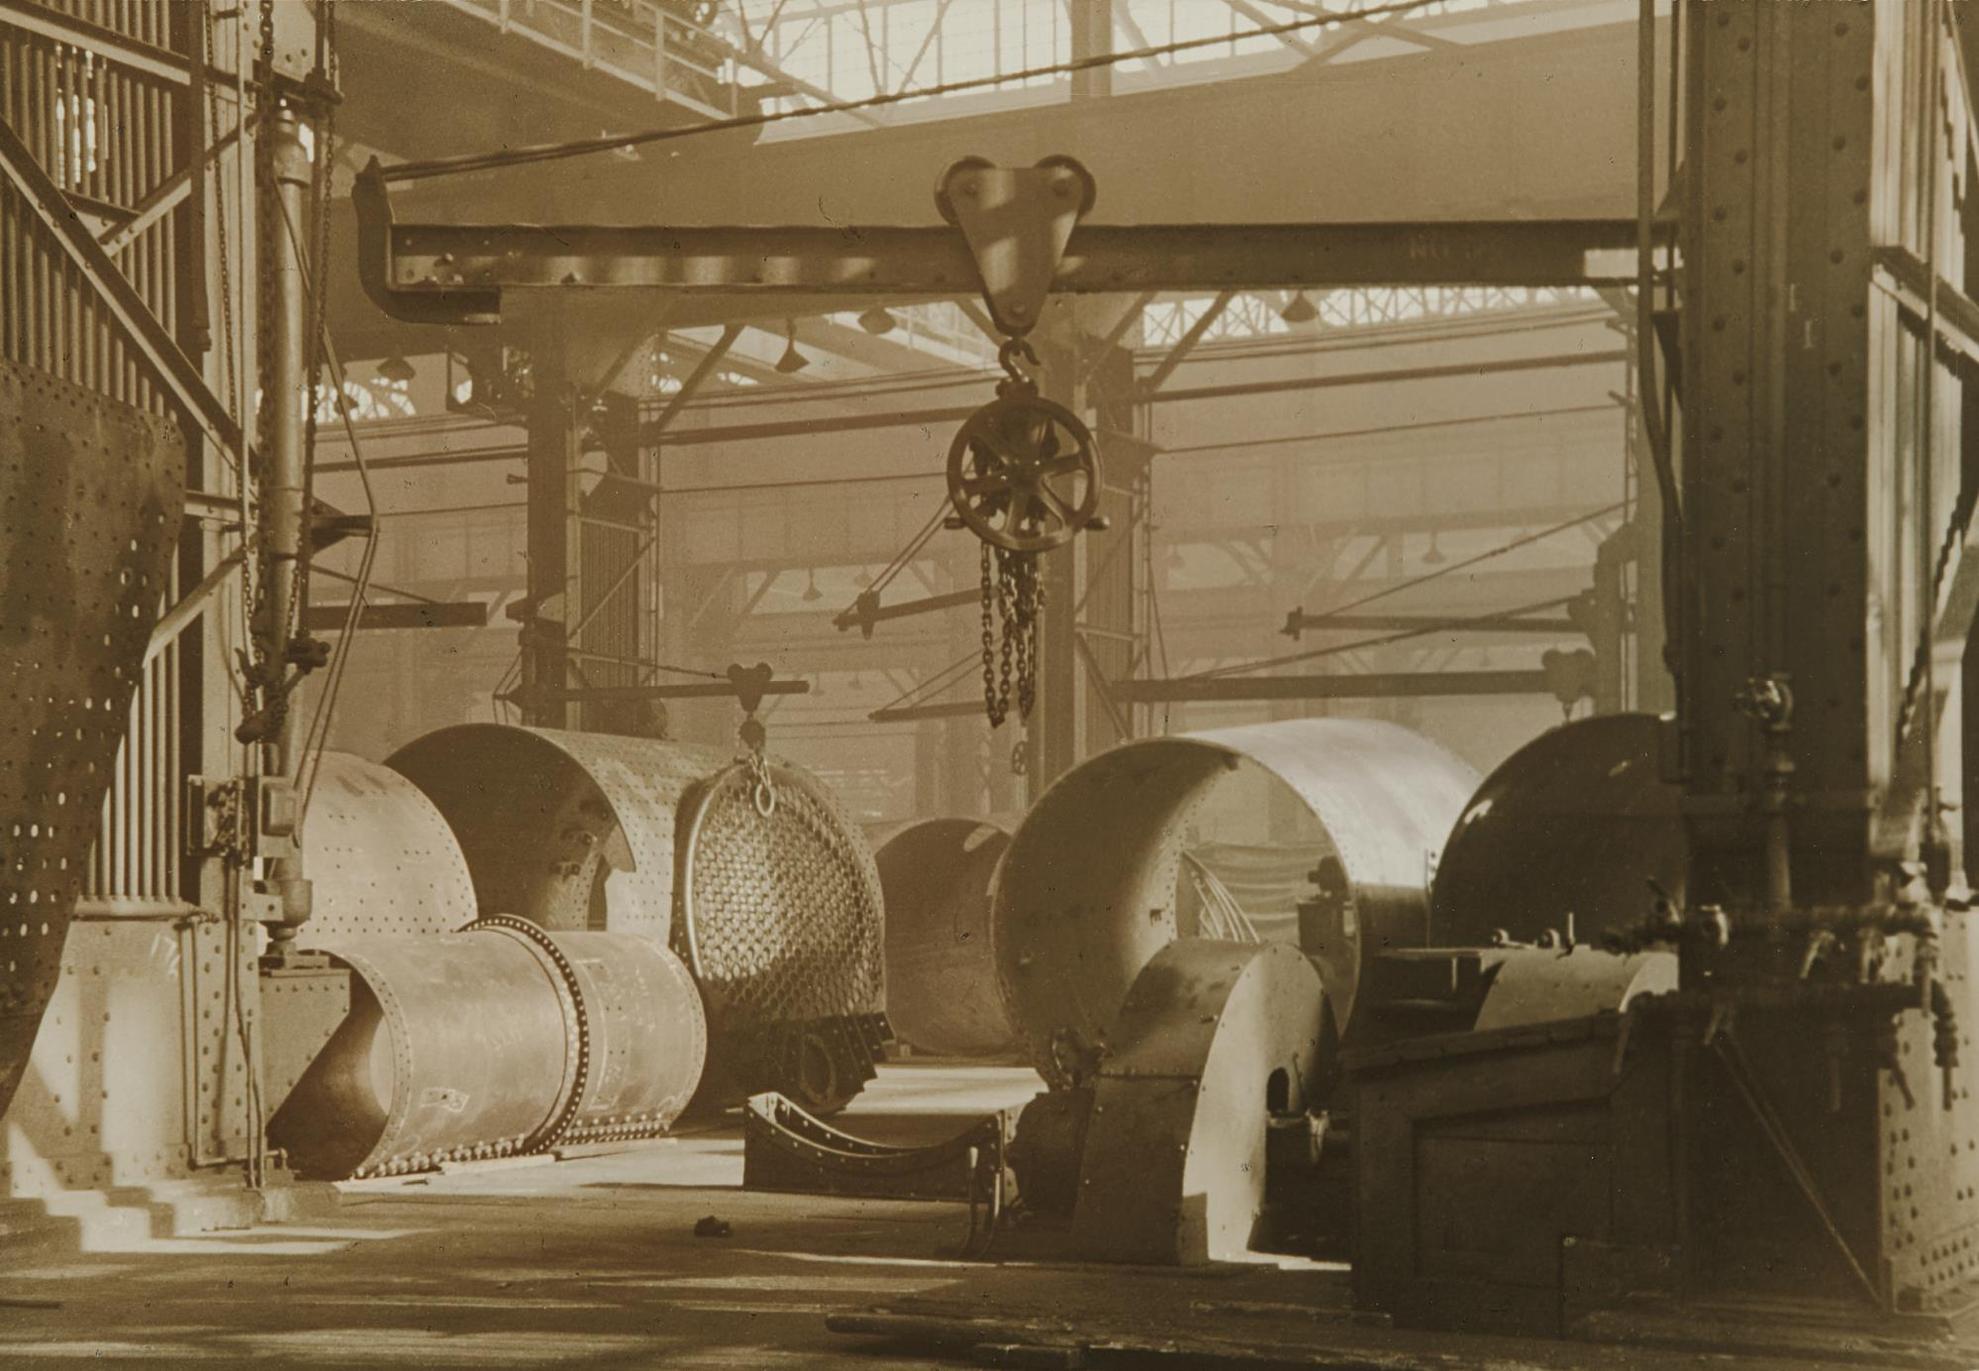 Charles Sheeler-Baldwin Locomotive Plant-1937